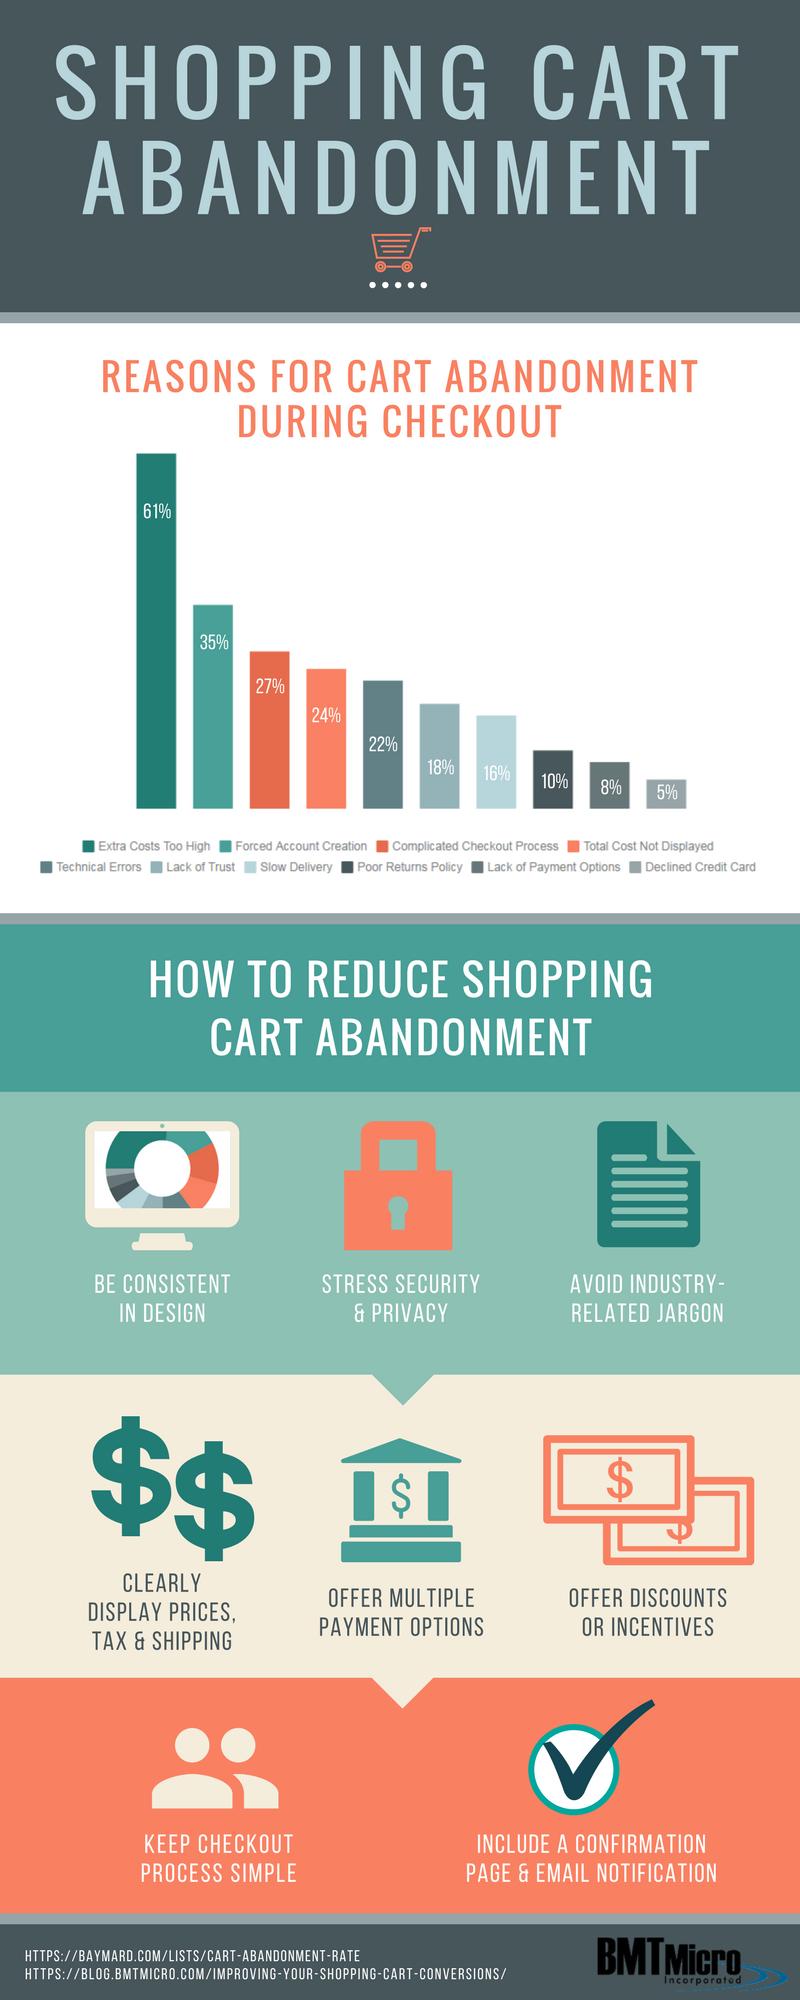 Online shopping cart abandonment